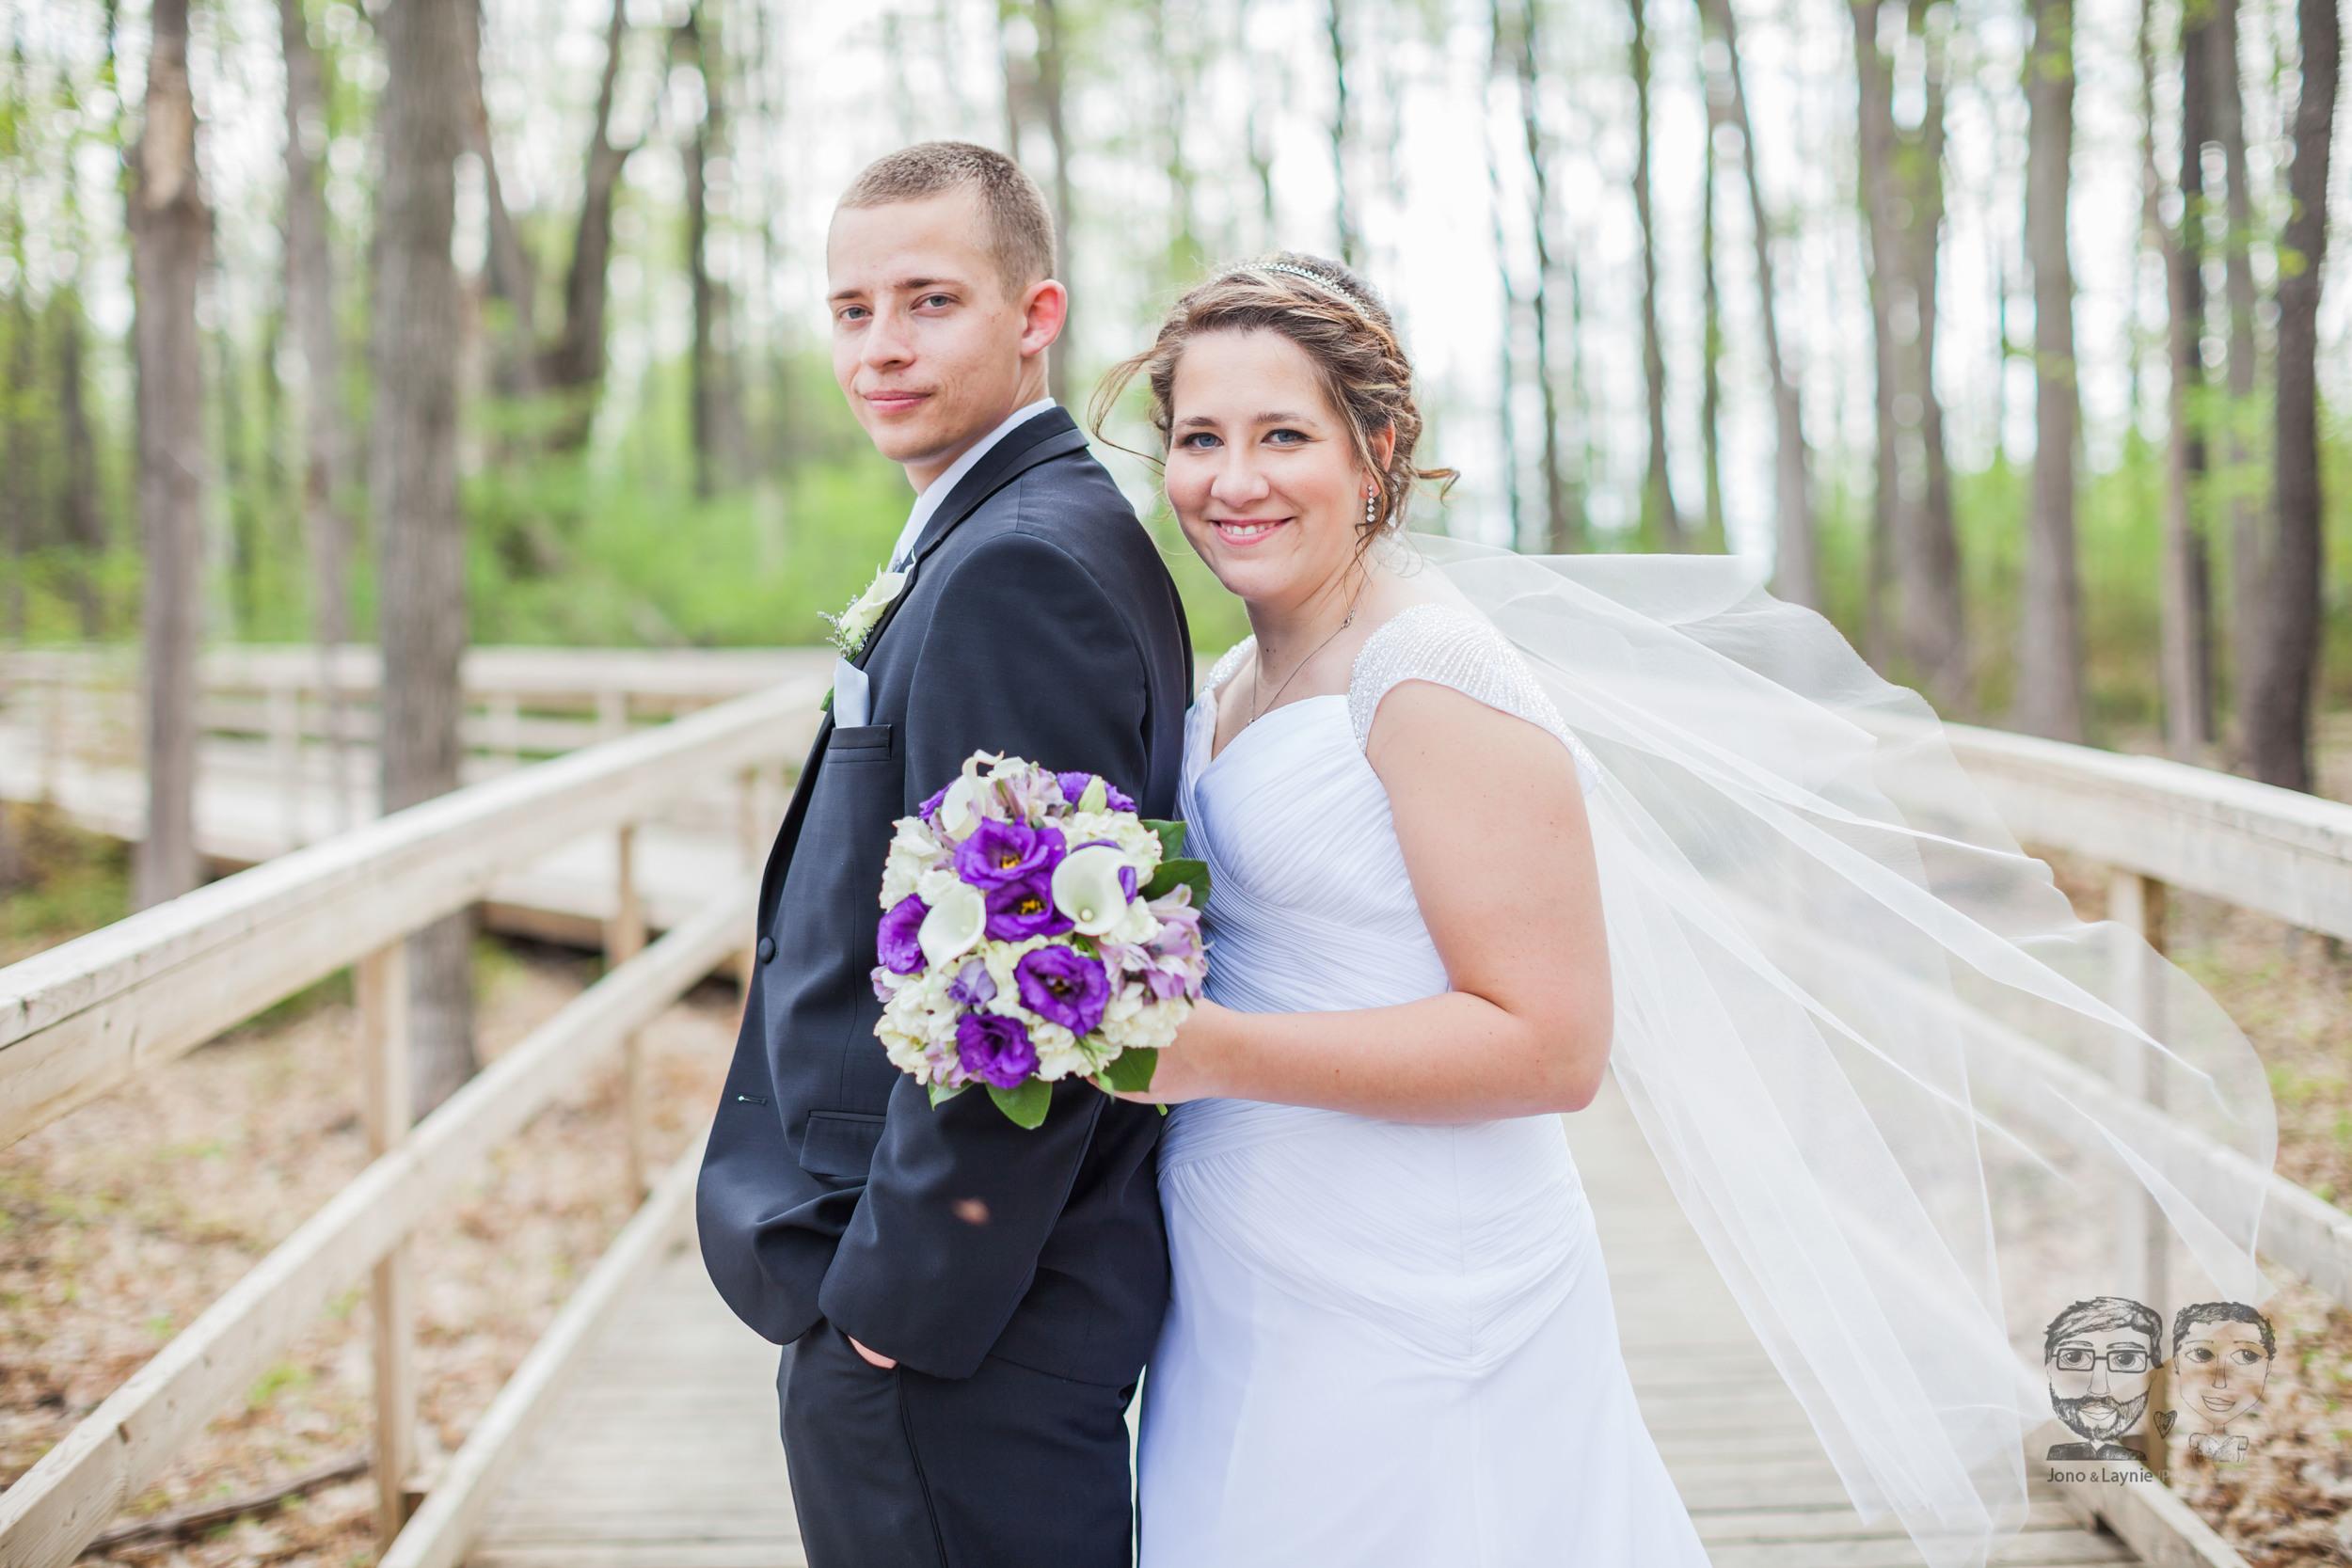 54Toronto Wedding Photographers and Videographers-Jono & Laynie Co.-Orangeville Wedding.jpg